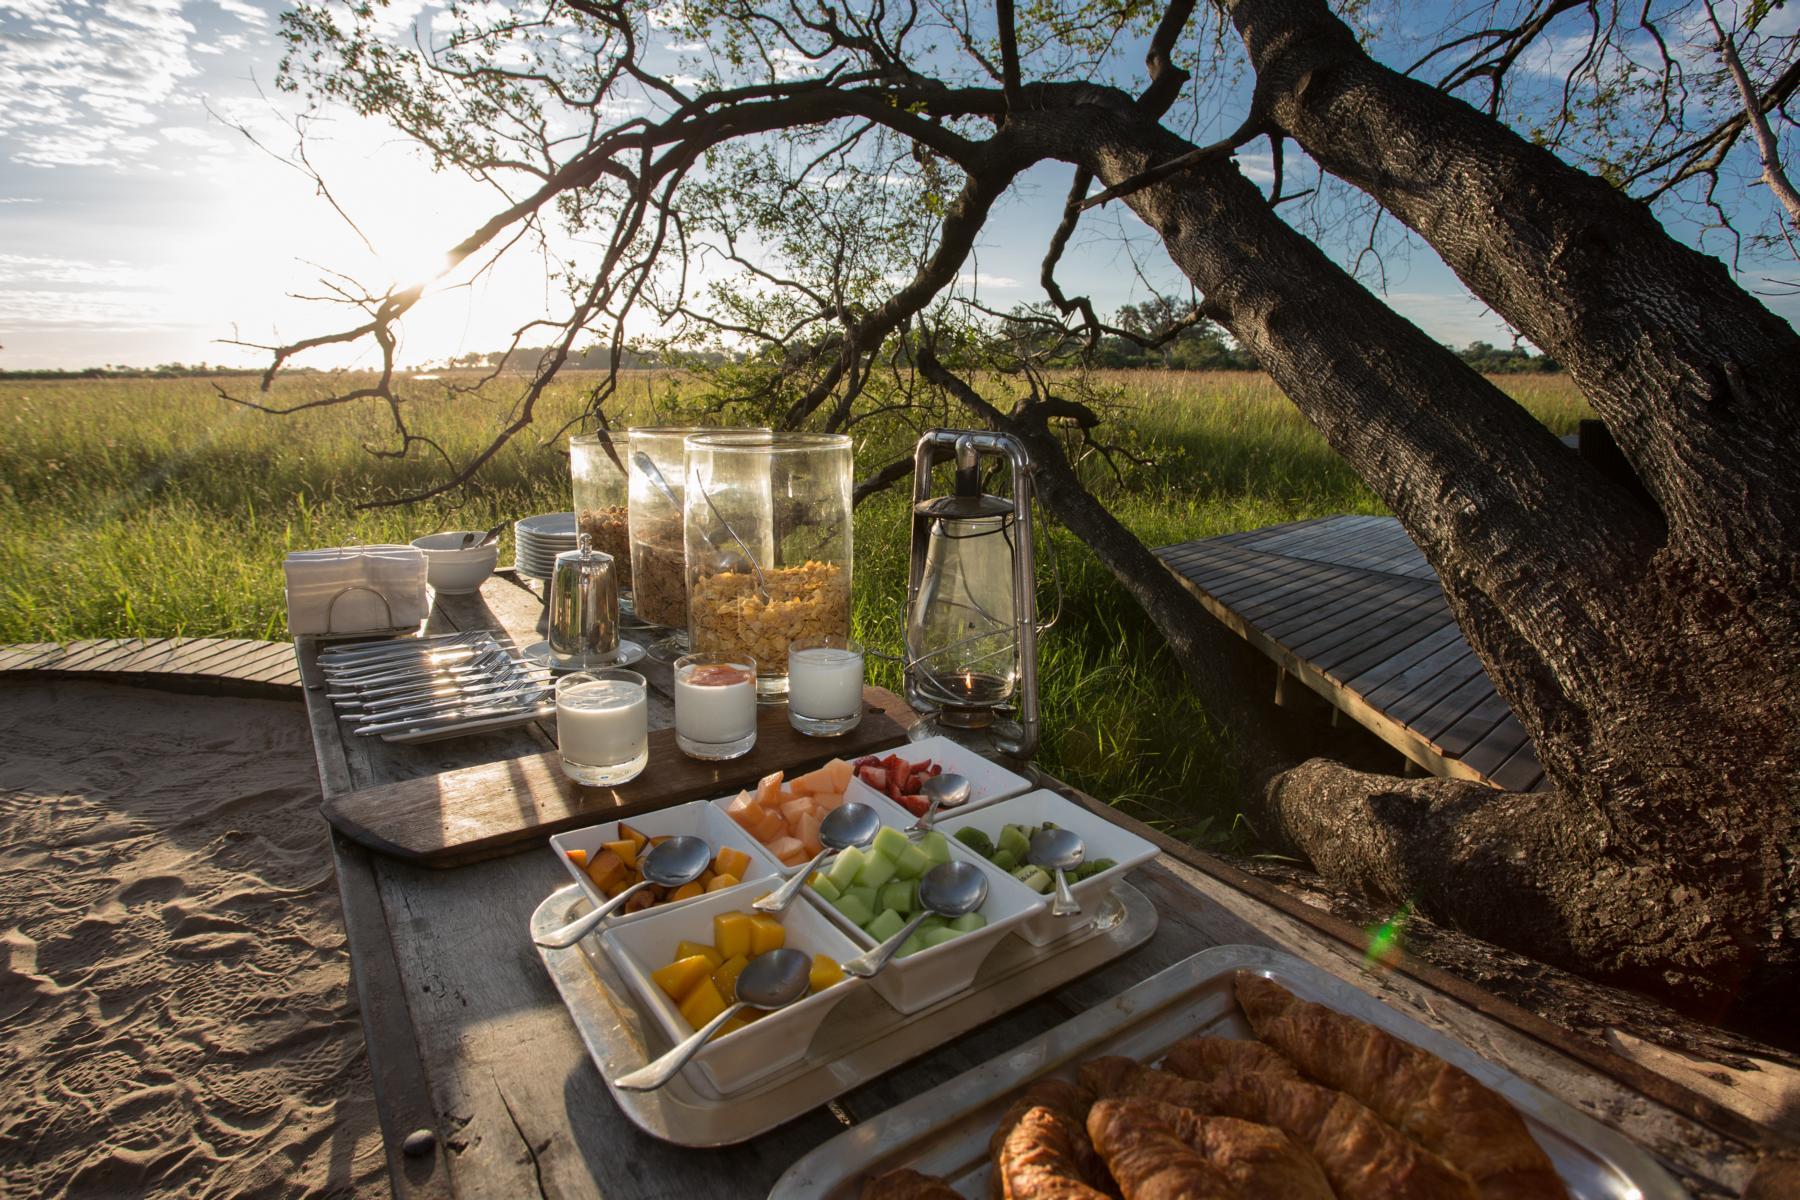 Frühstück im Abu Camp, Okavango Delta, Botswana